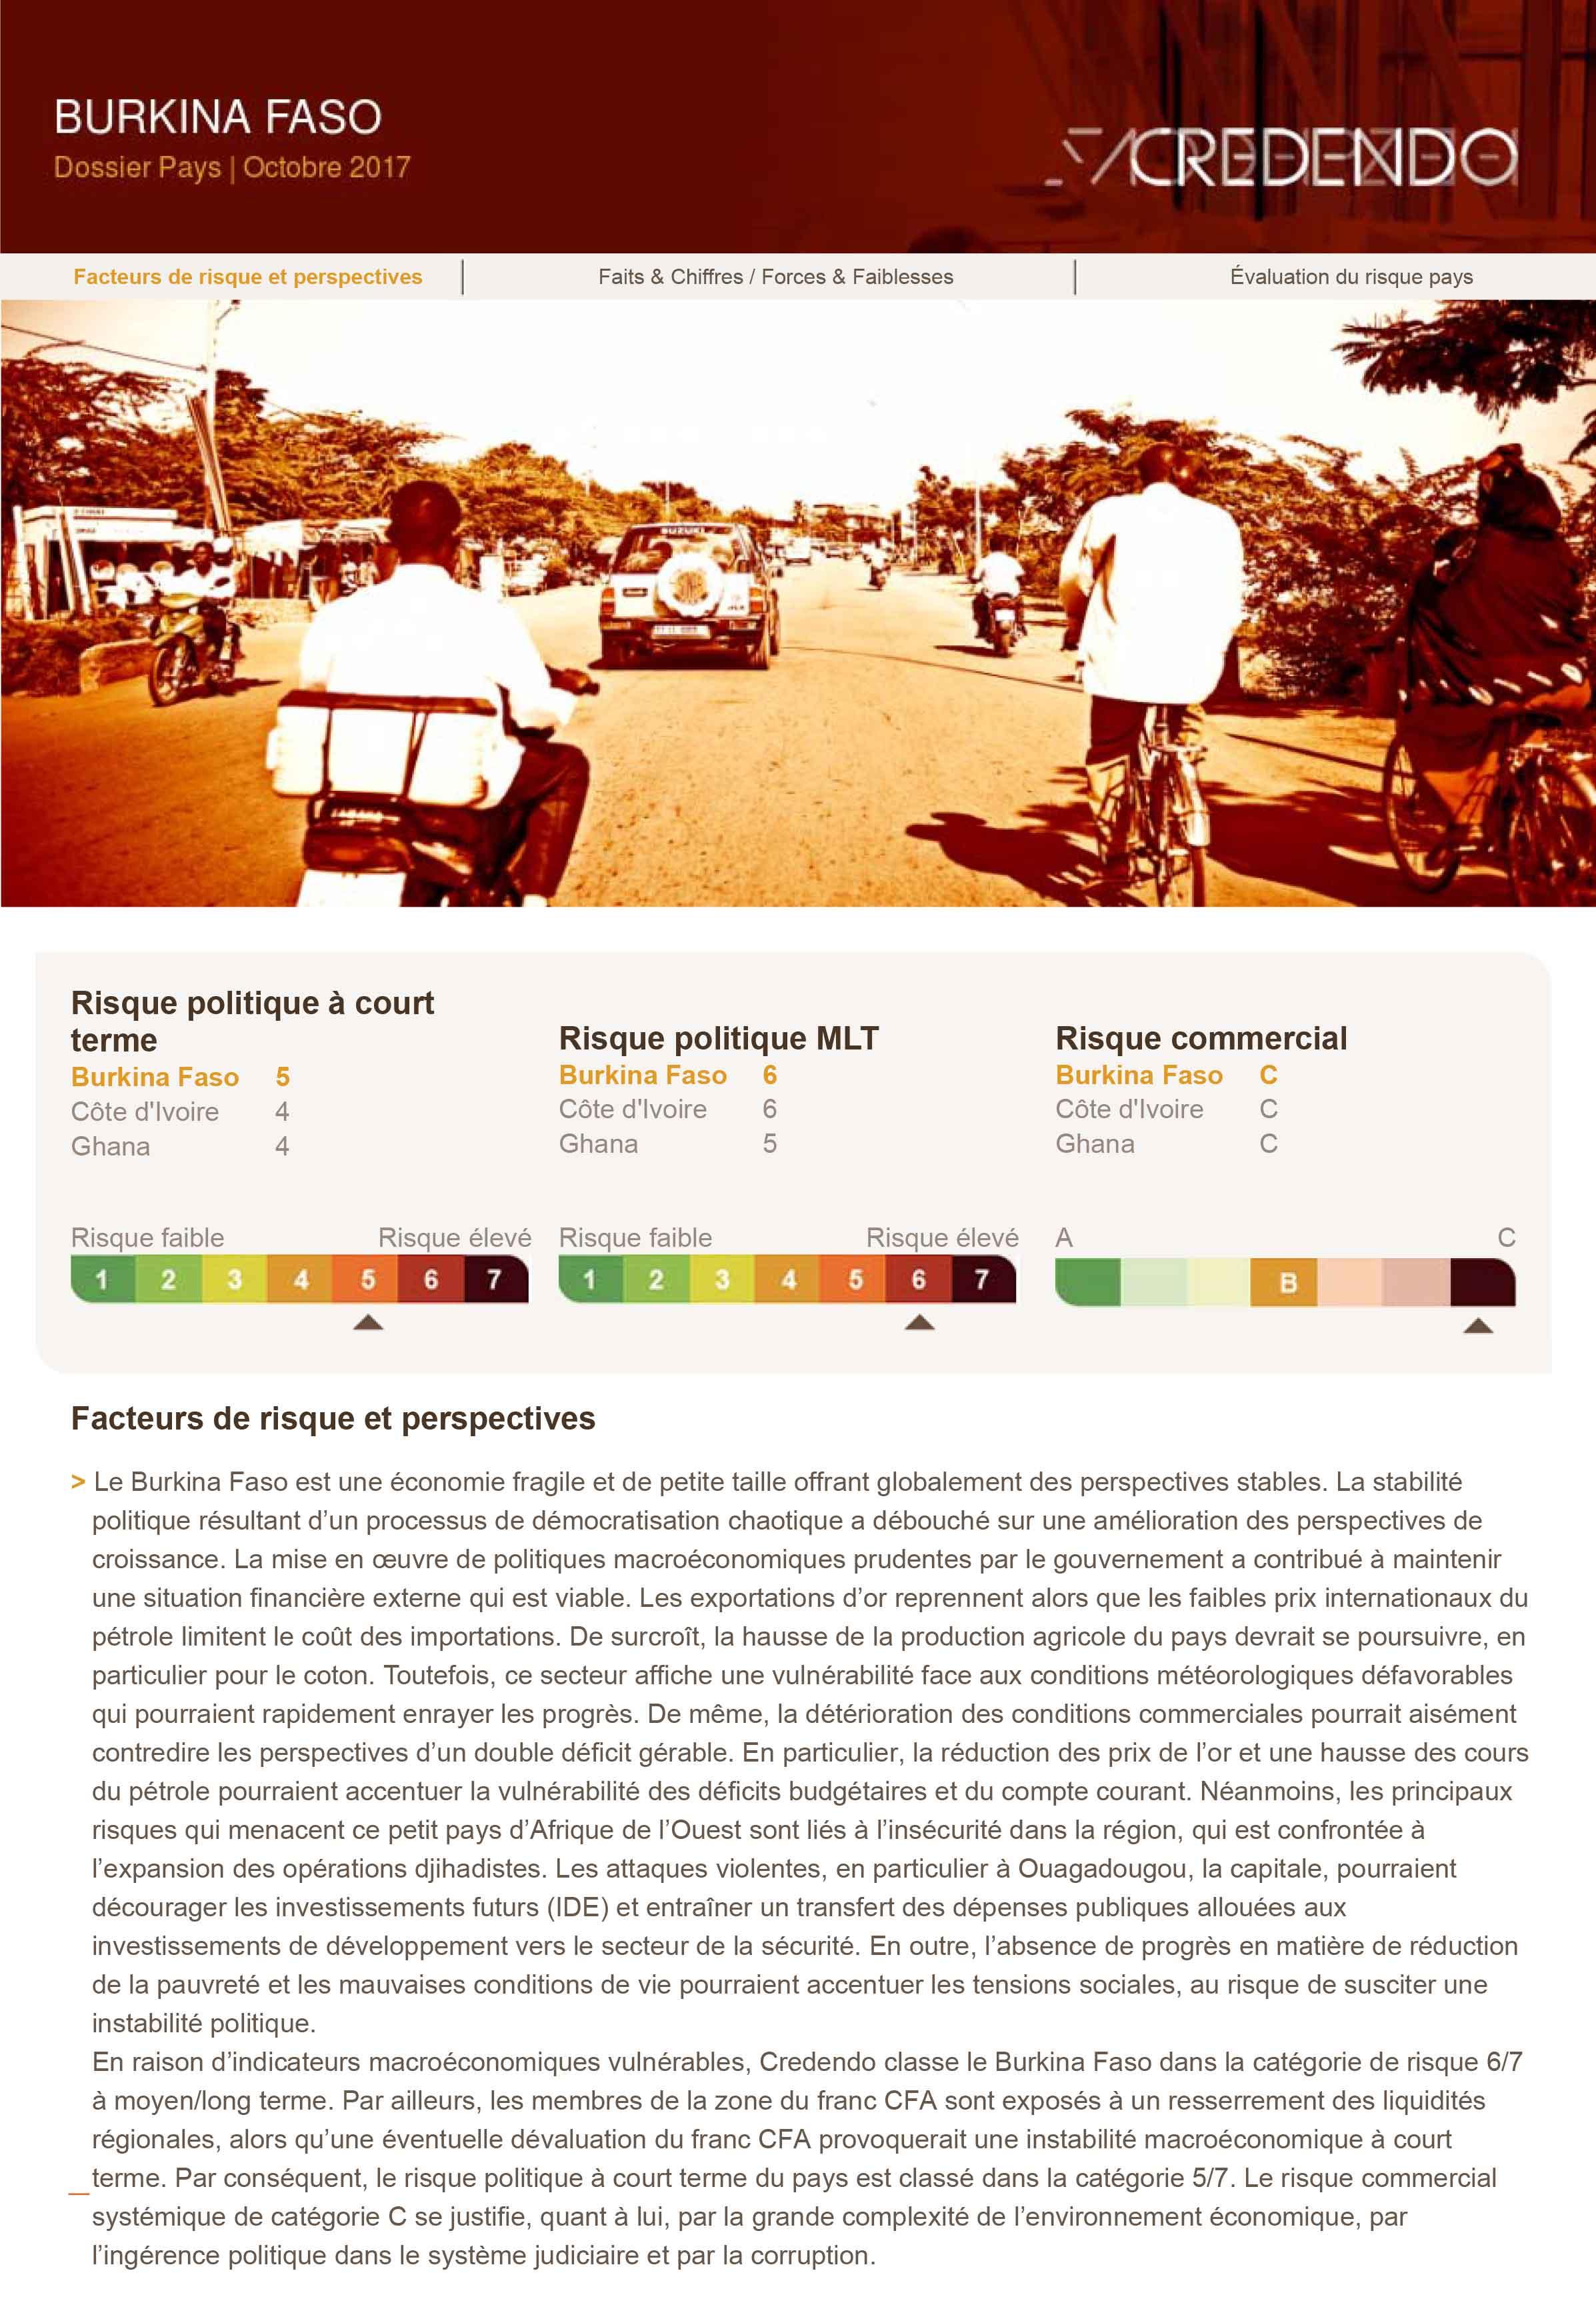 Dossier Pays : Burkina Faso – Octobre 2017